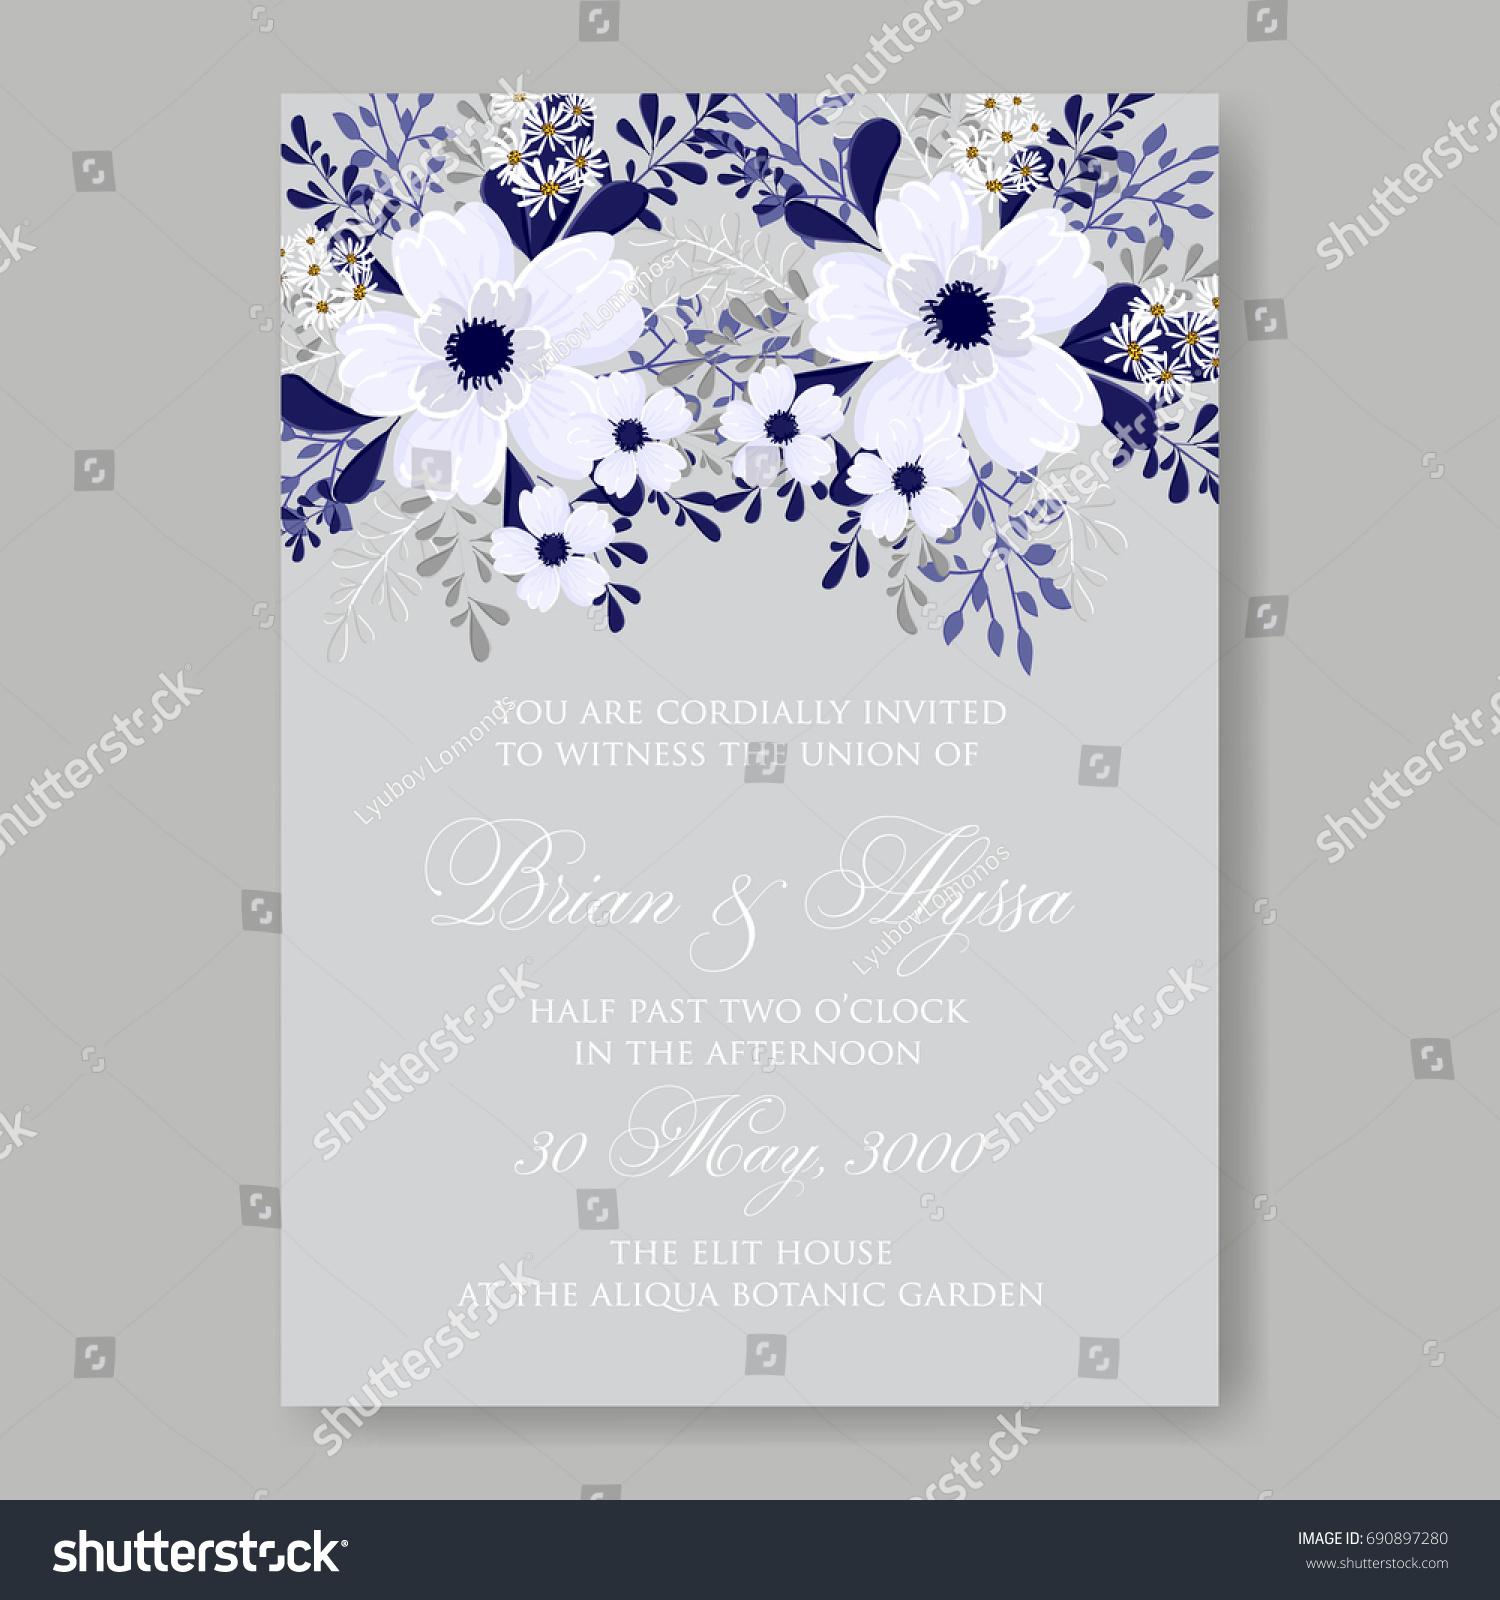 Poinsettia Peony Anemone Wedding Invitation Template Stock Vector HD ...